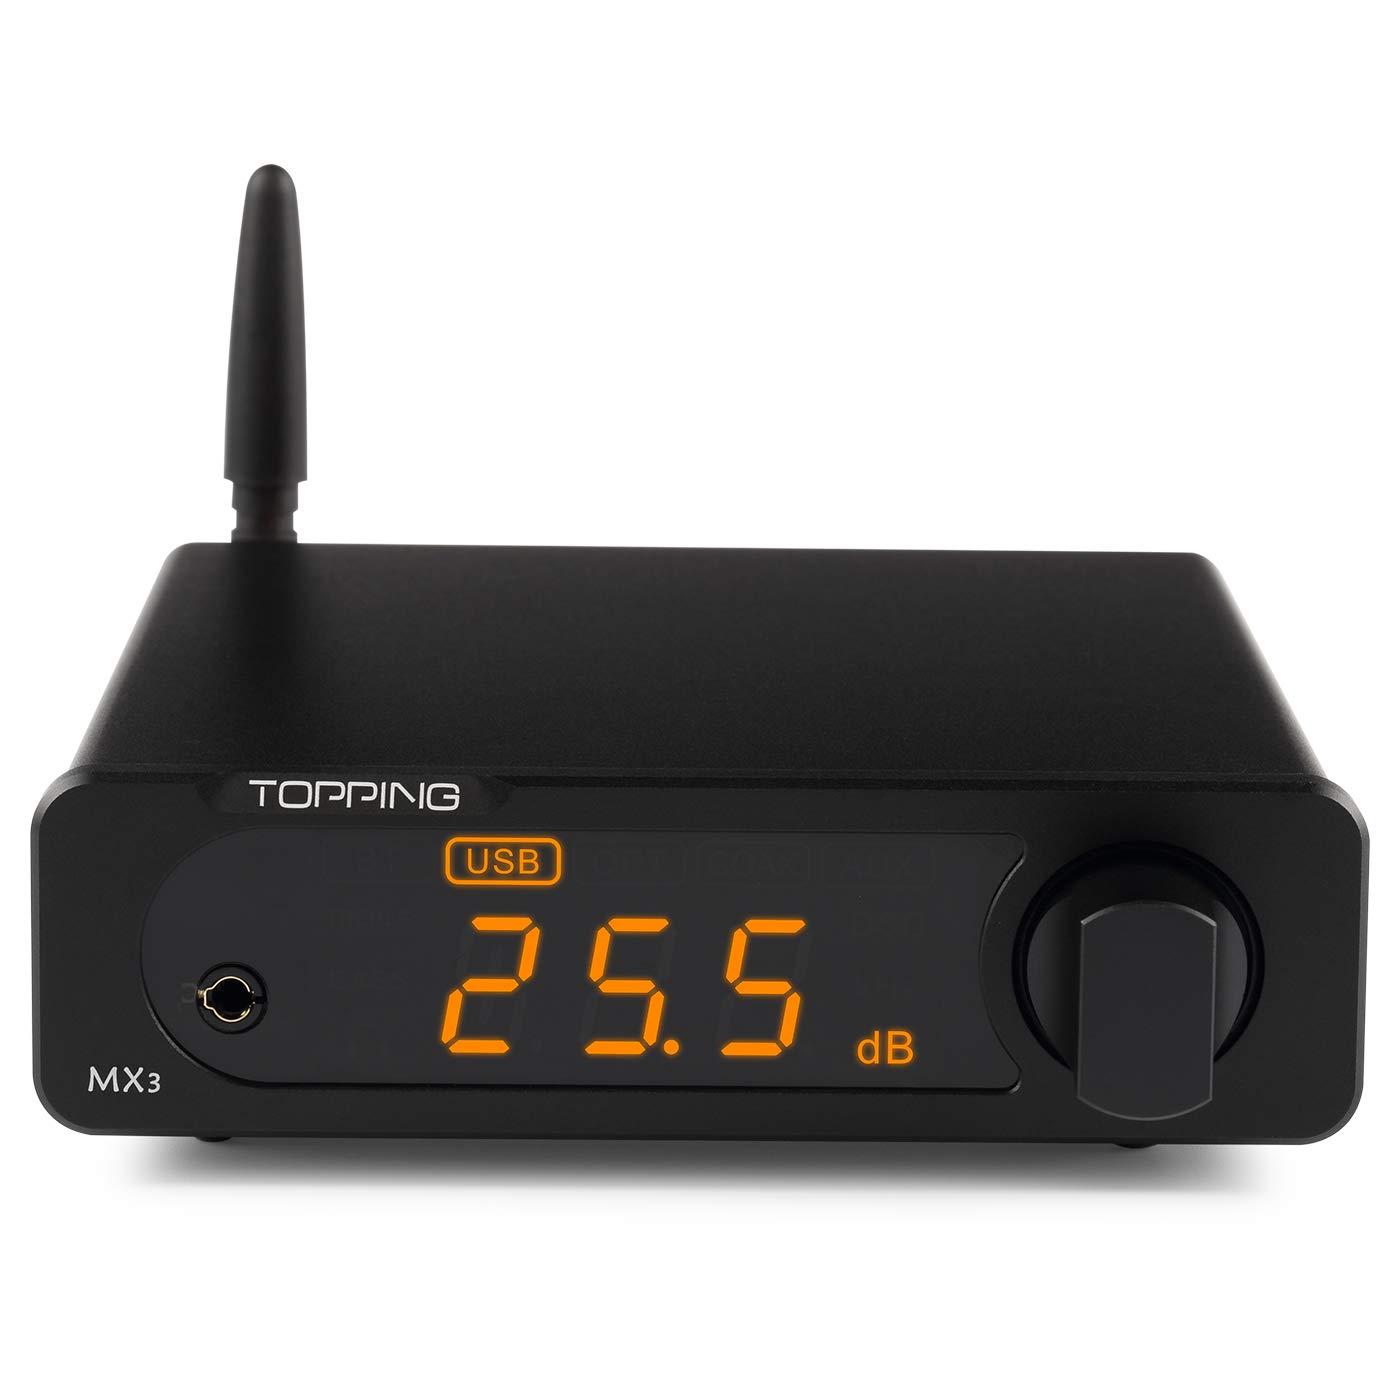 Topping MX3 TDA7498E Mini Multifunction Bluetooth Digital HiFi Headphone Amp Audio Amplifier 40w 2 USB Coaxial Fiber DAC Decoder Amplifiers(Black)